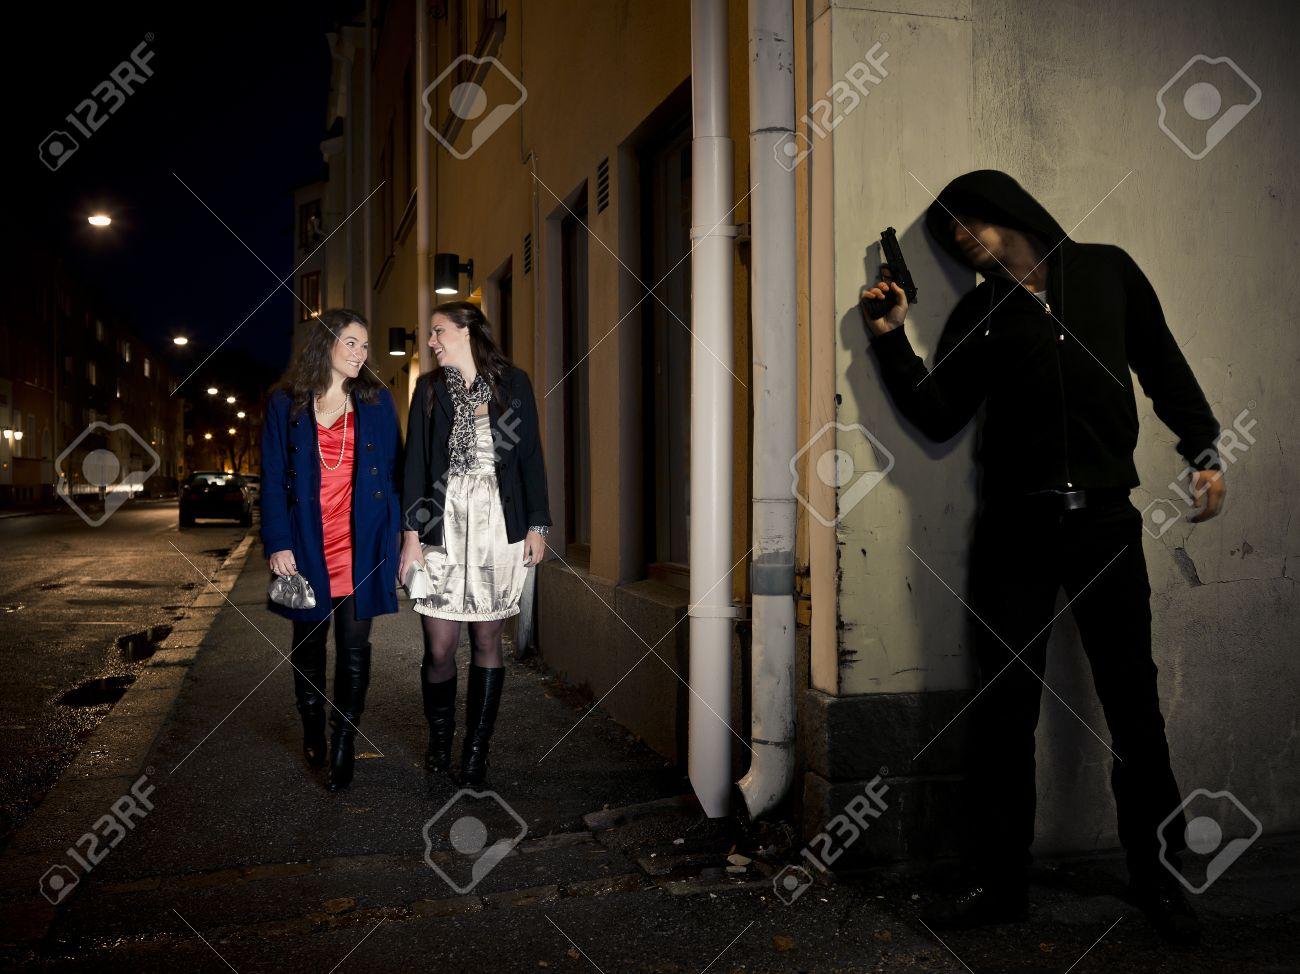 Hooded man stalking two women behind a corner holding a gun Stock Photo - 11223865